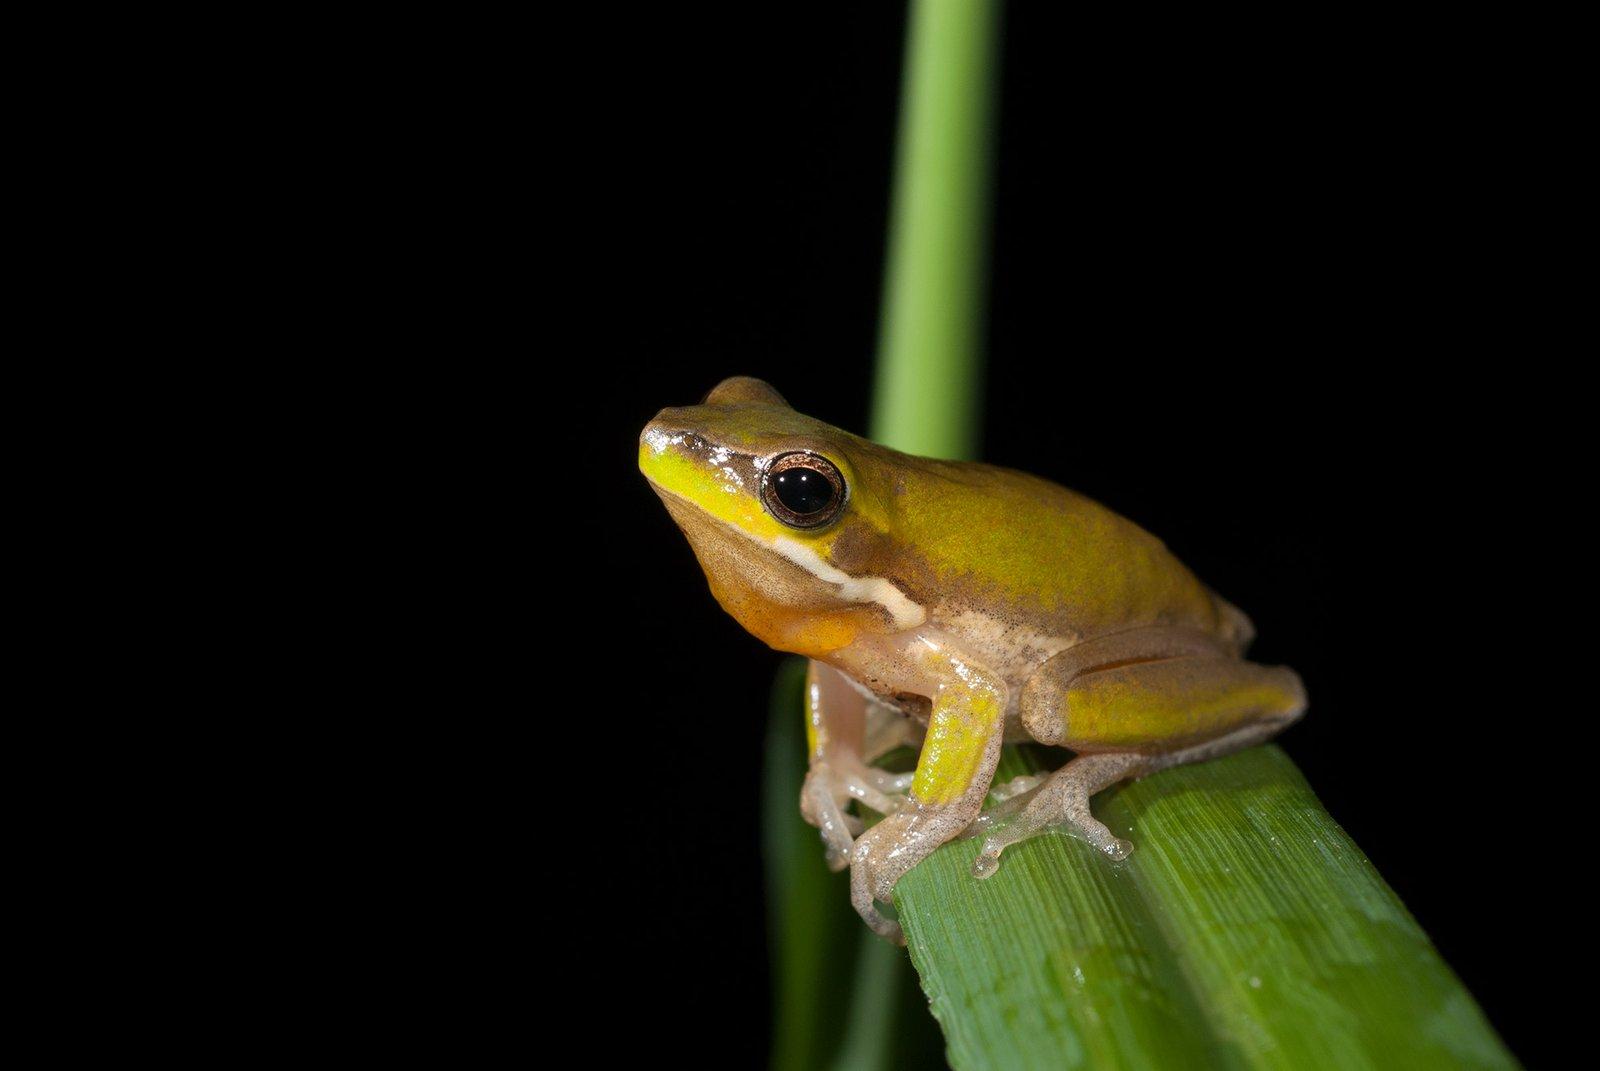 Calling Eastern Dwarf Tree Frog, Litoria fallax